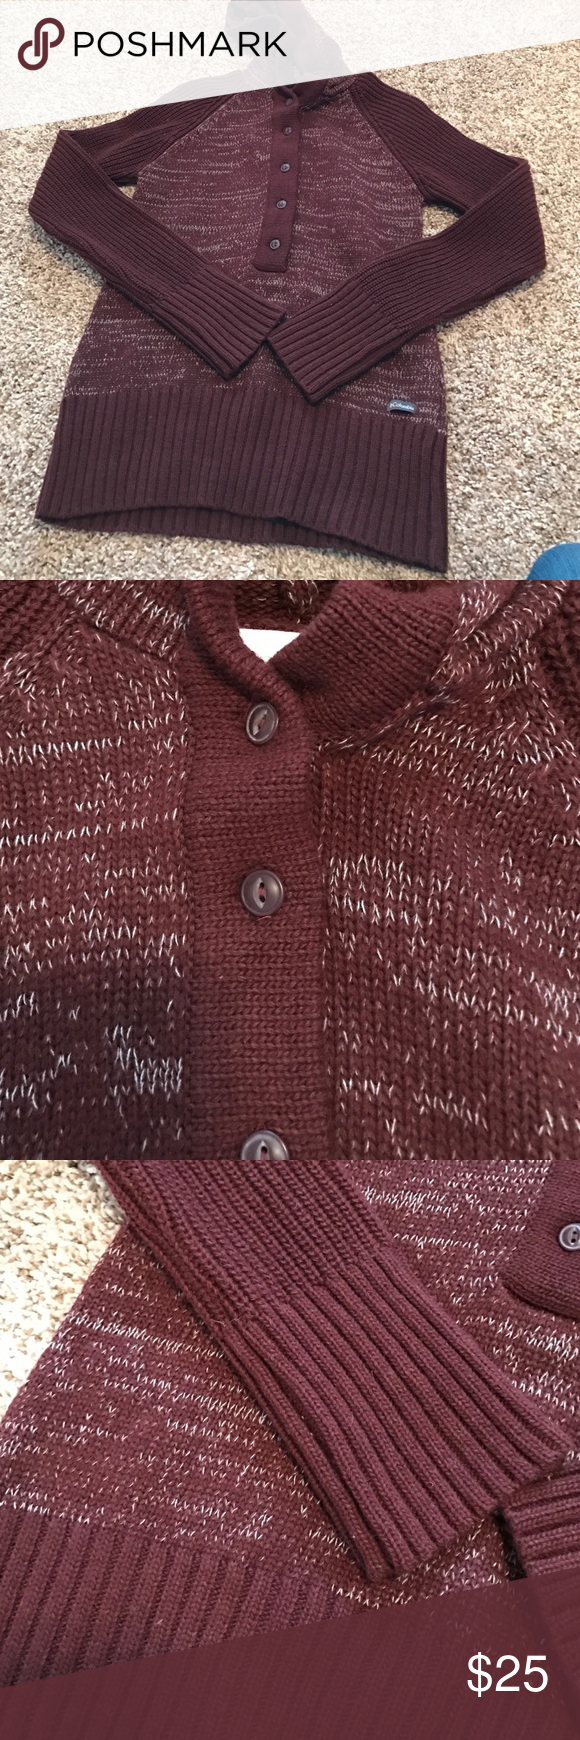 Columbia sweater Never worn! Columbia sweater perfect condition. 28% wool Columbia Tops Sweatshirts & Hoodies